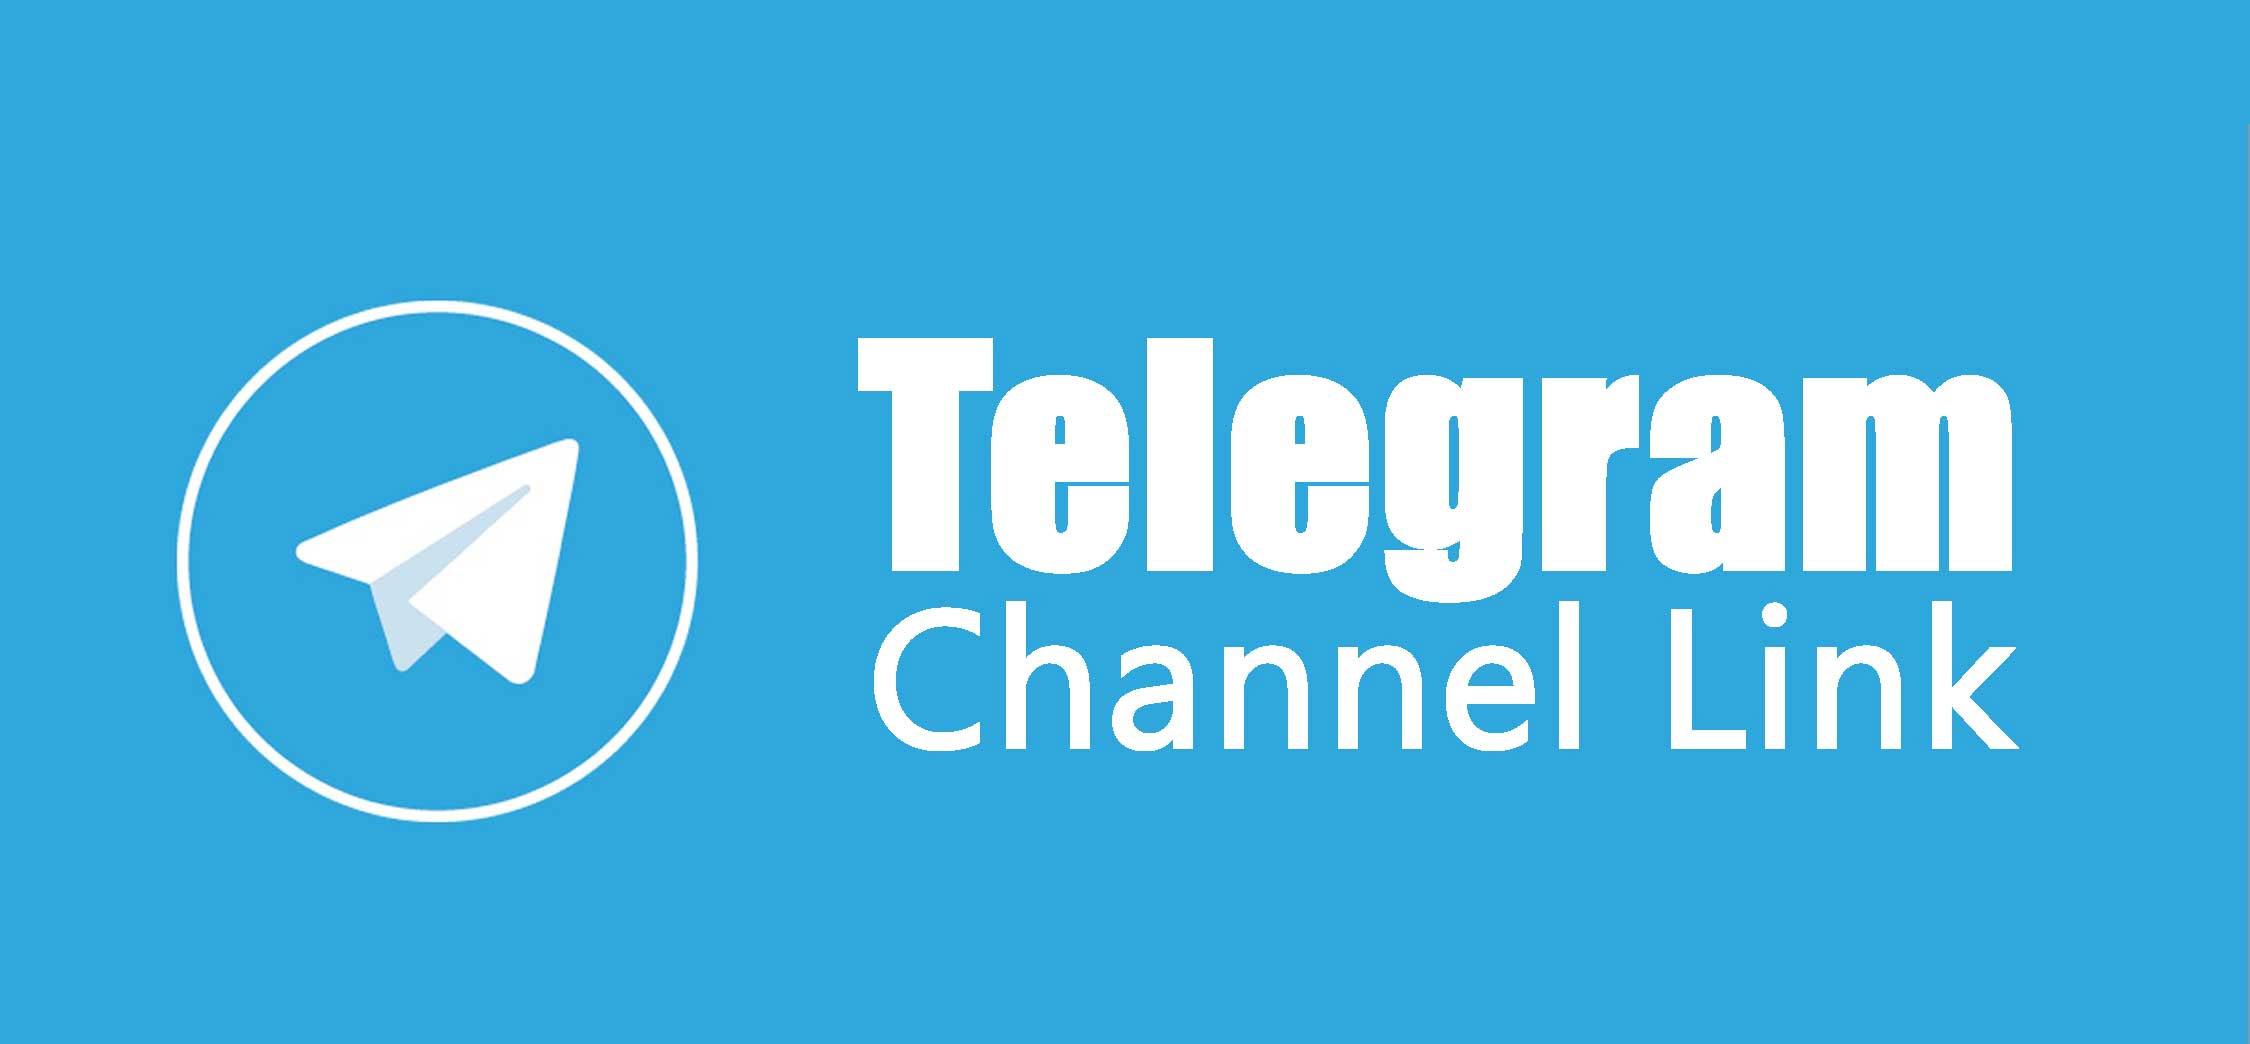 Best Telegram Channels link List 20 टेलीग्राम चैनल ...